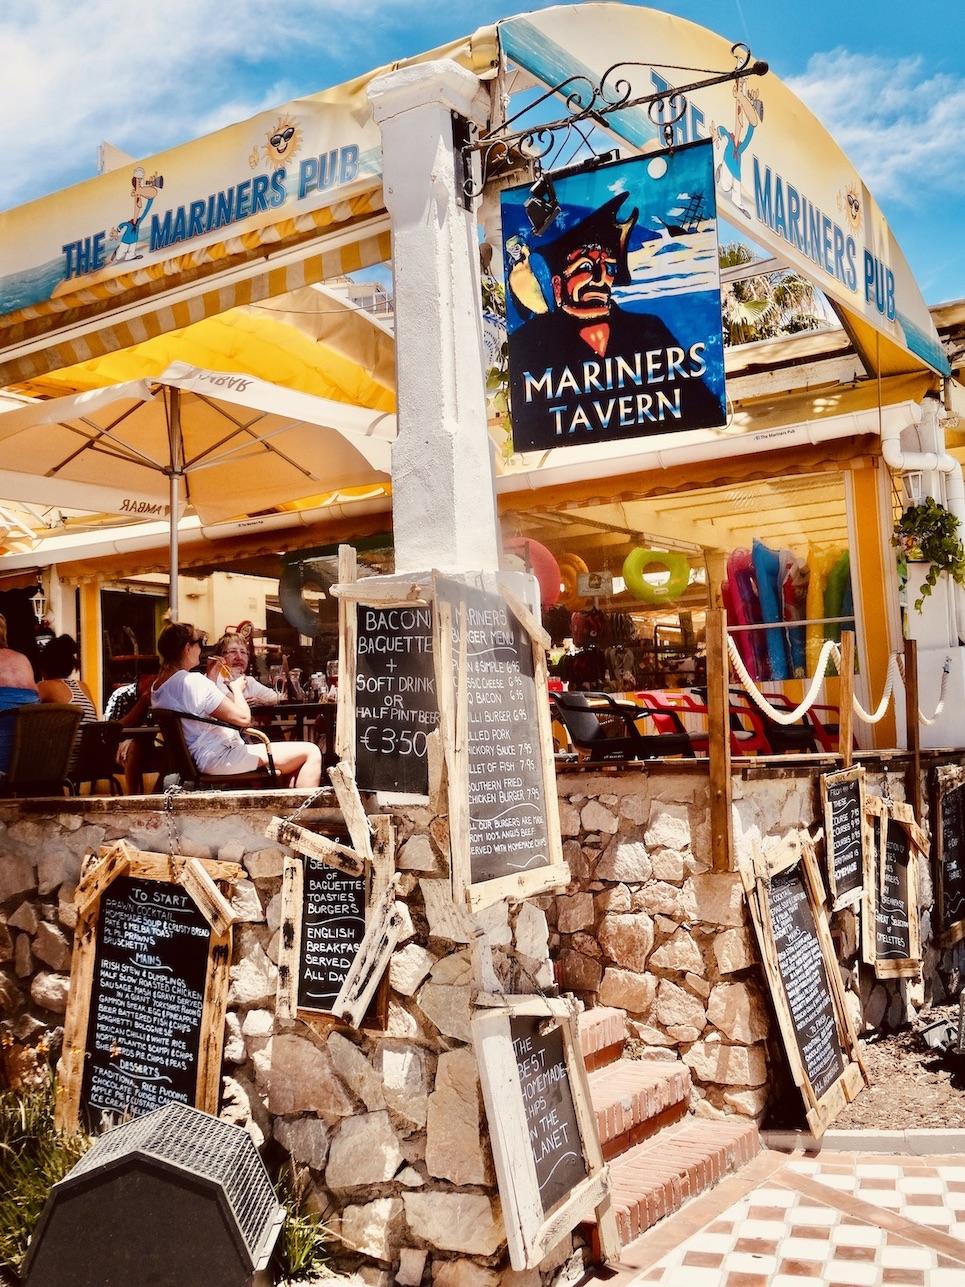 Mariners Tavern Benalmadena.